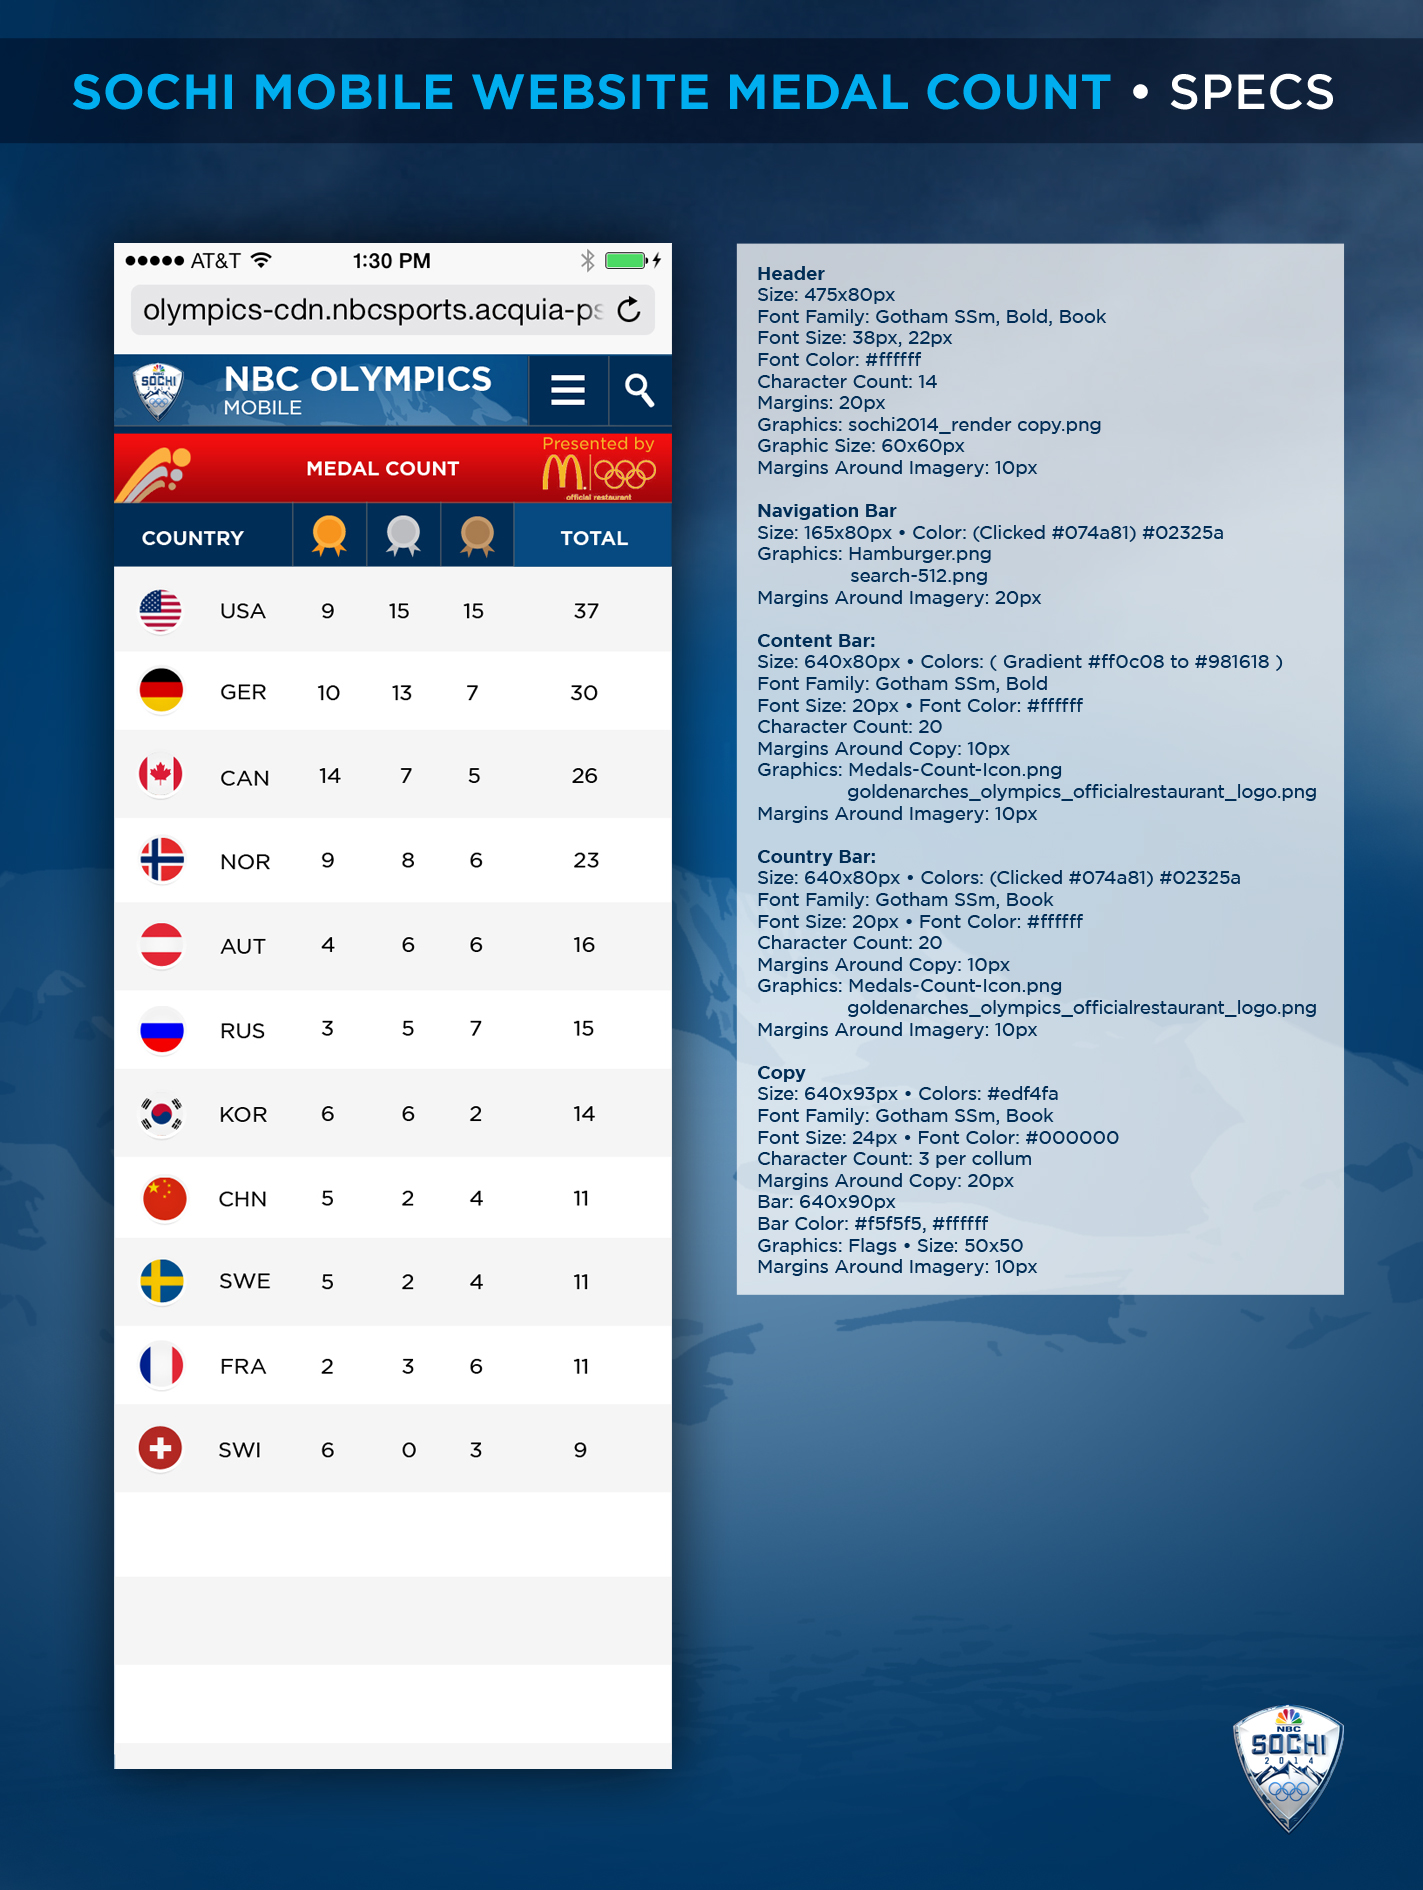 Sochi-Mobile-Website-Style-Guide-Medal-Count.jpg